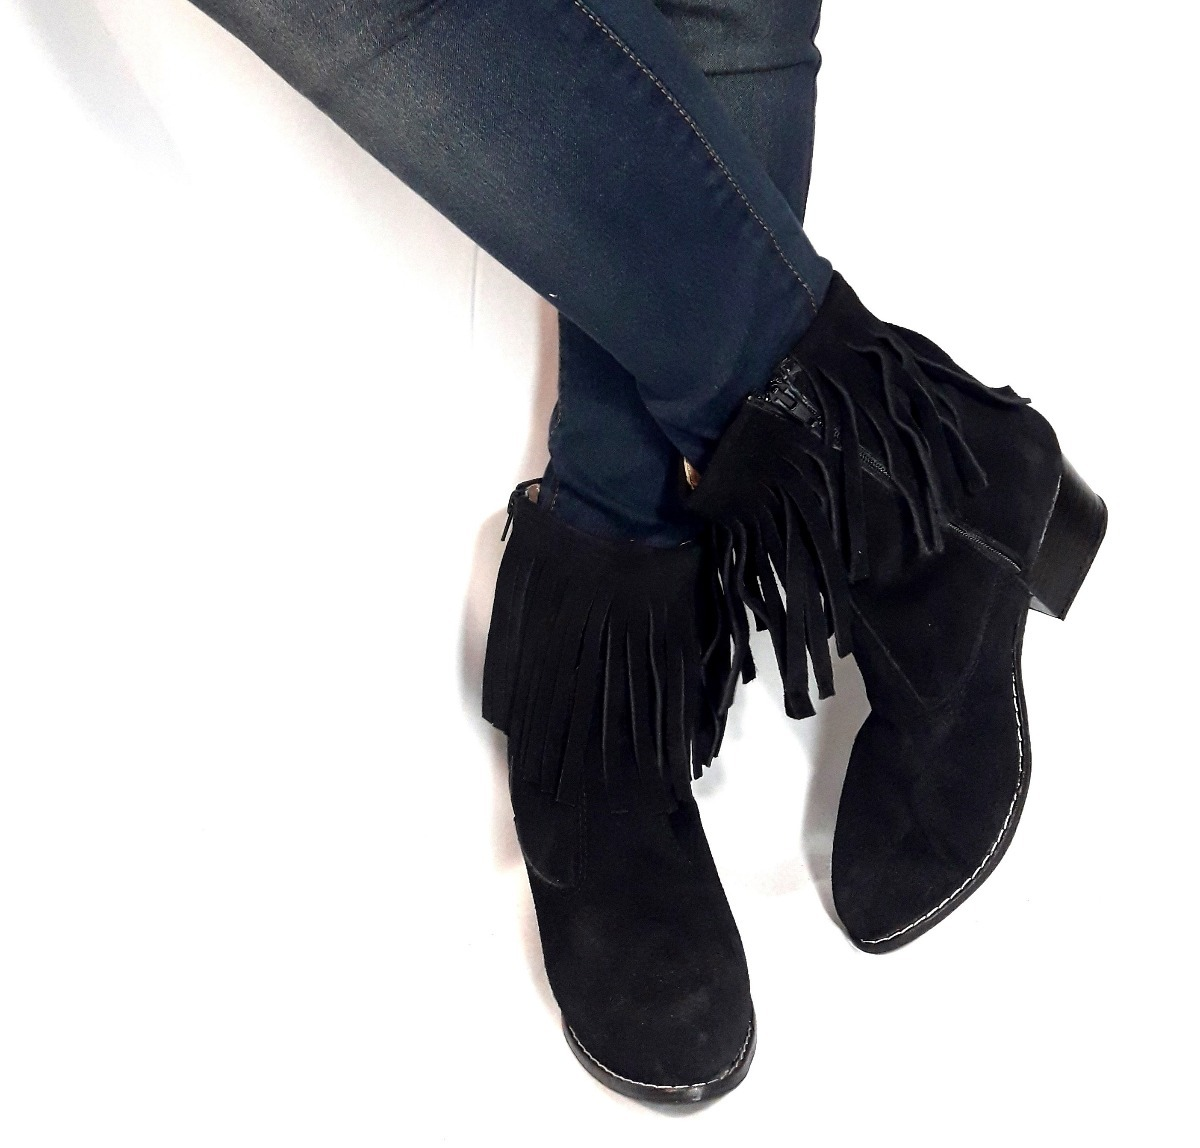 f21c88be38 sam123 botas cortas mujer talle grande cuotas cheroka2 negra. Cargando zoom.